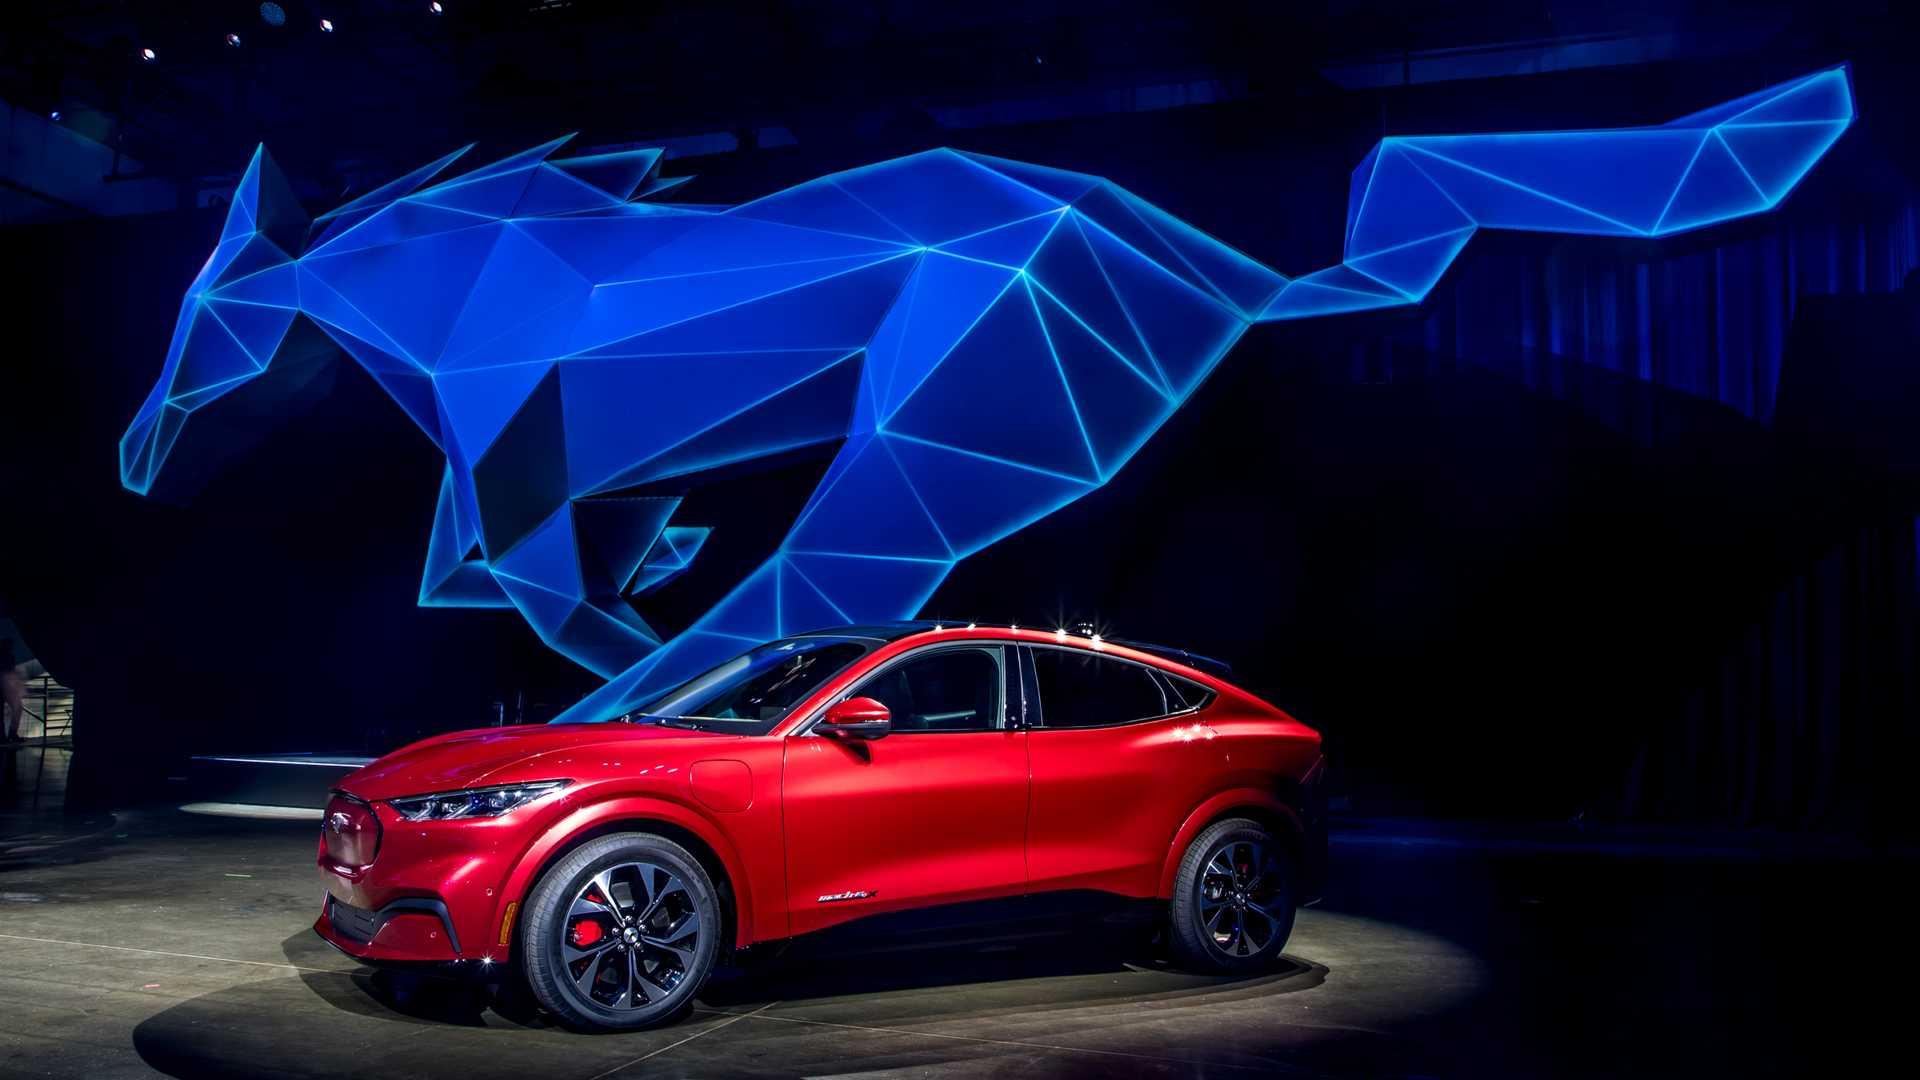 Sem maçaneta, Mustang SUV ainda custará a chegar no Brasil